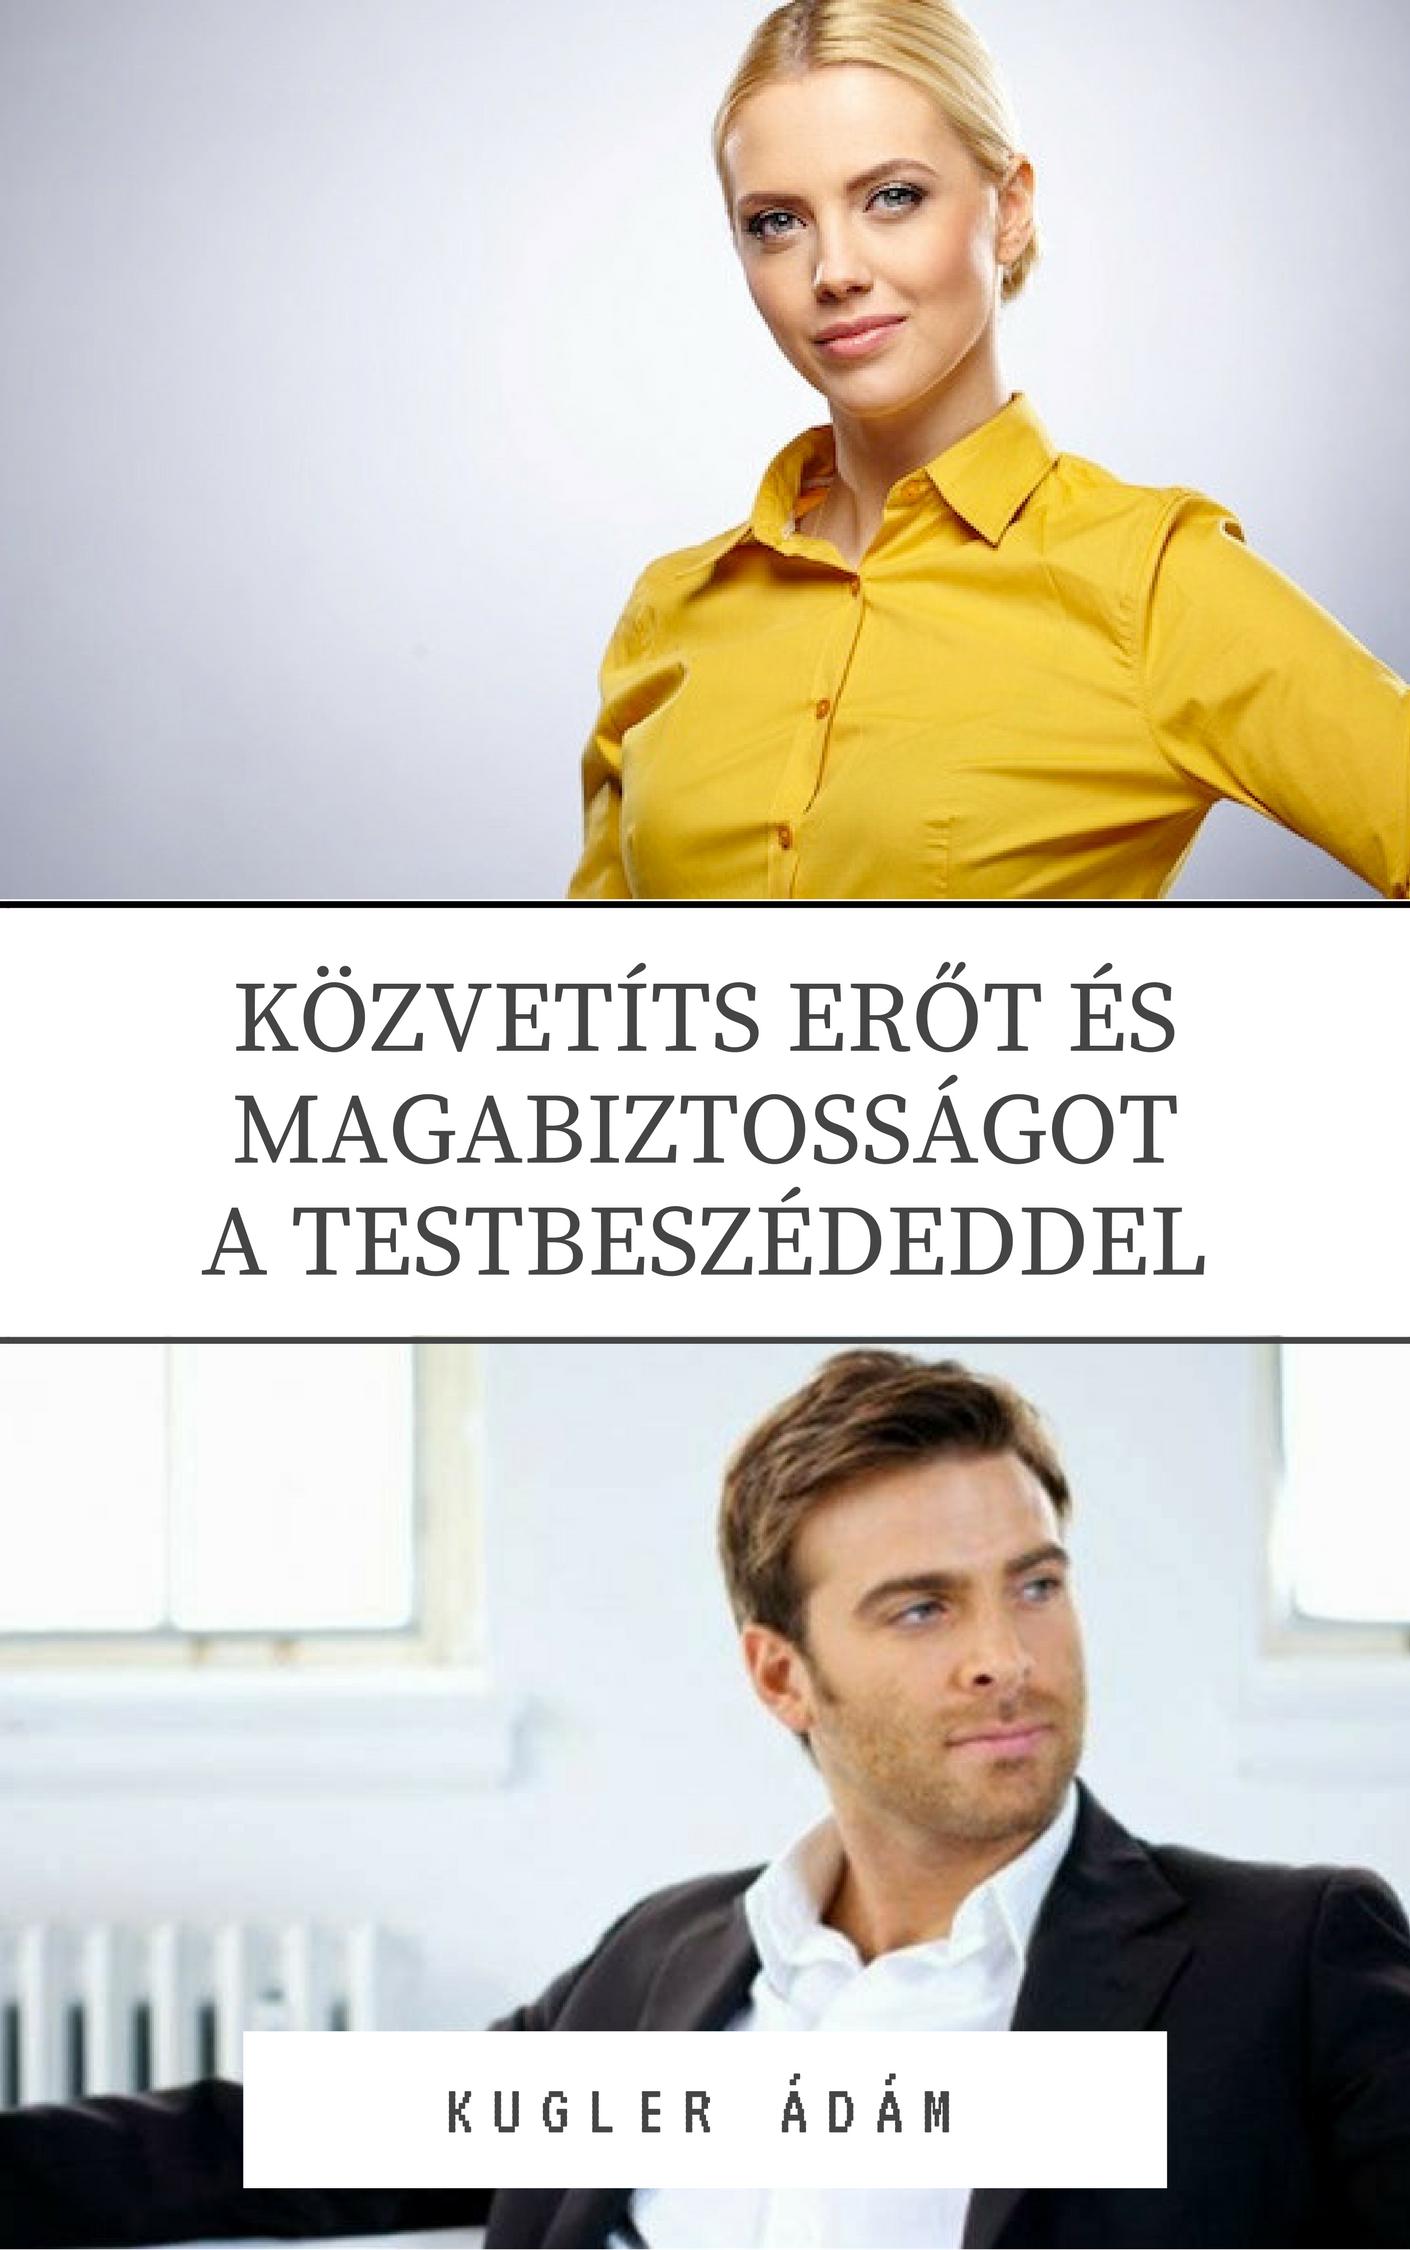 hogyan_kozvetits_erot_es_magabiztossagoz.png